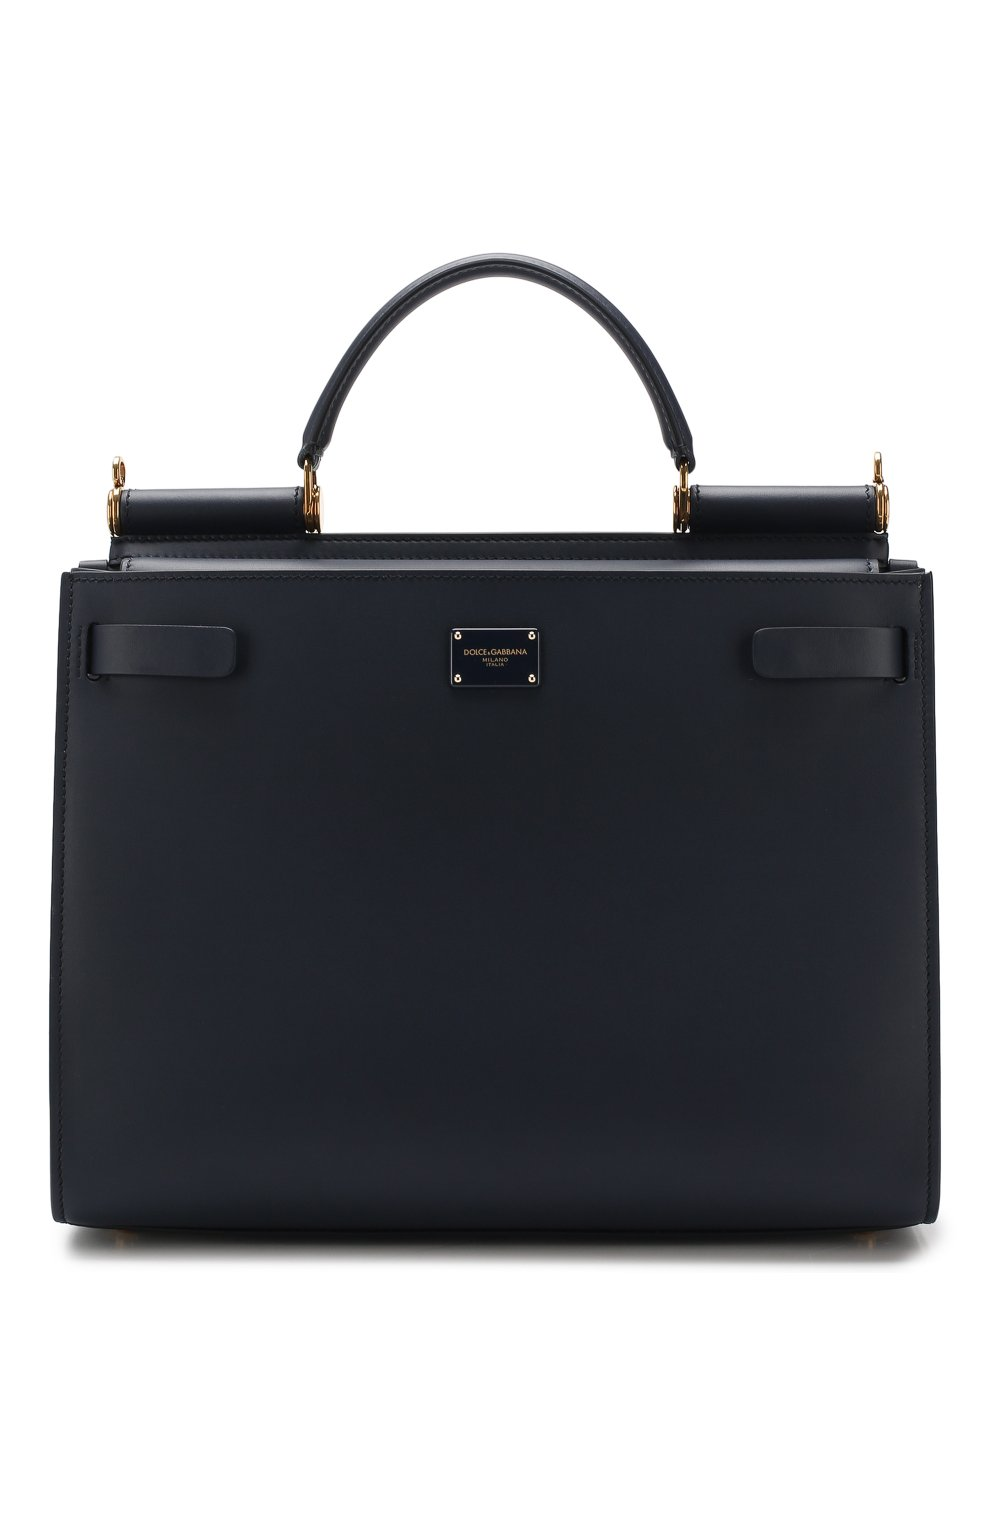 c03e853b879a Сумки Dolce & Gabbana по цене от 19 700 руб. купить в интернет-магазине ЦУМ